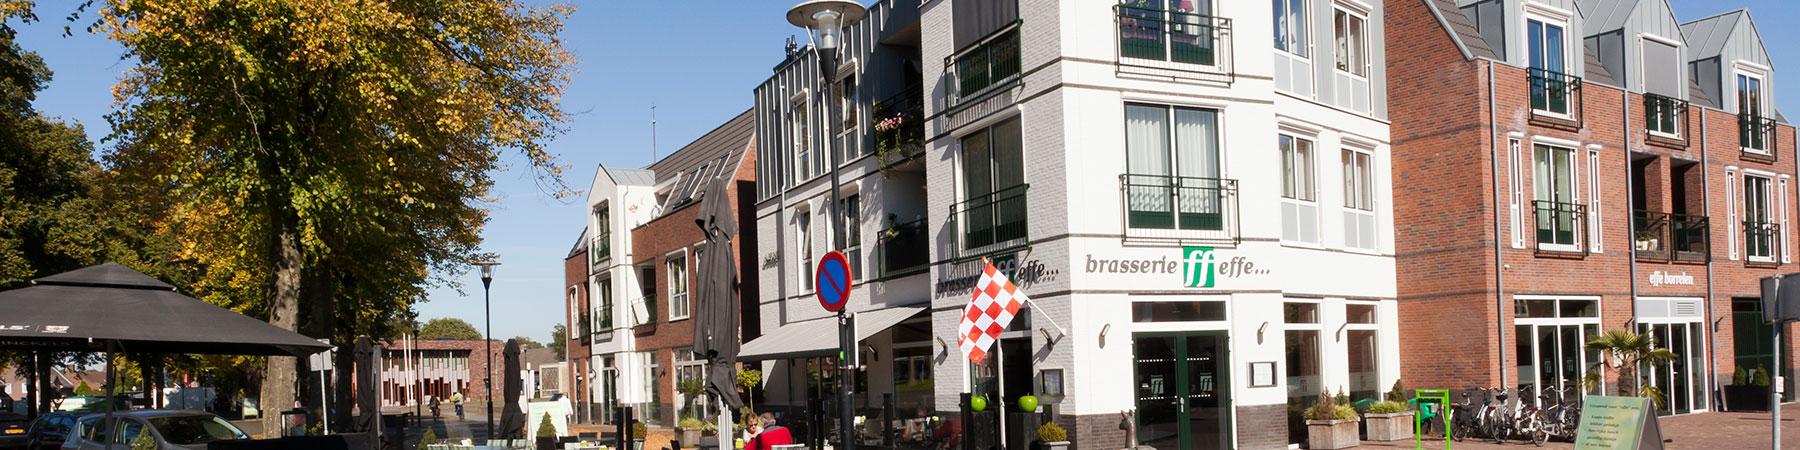 brasserie-effe-overloon1